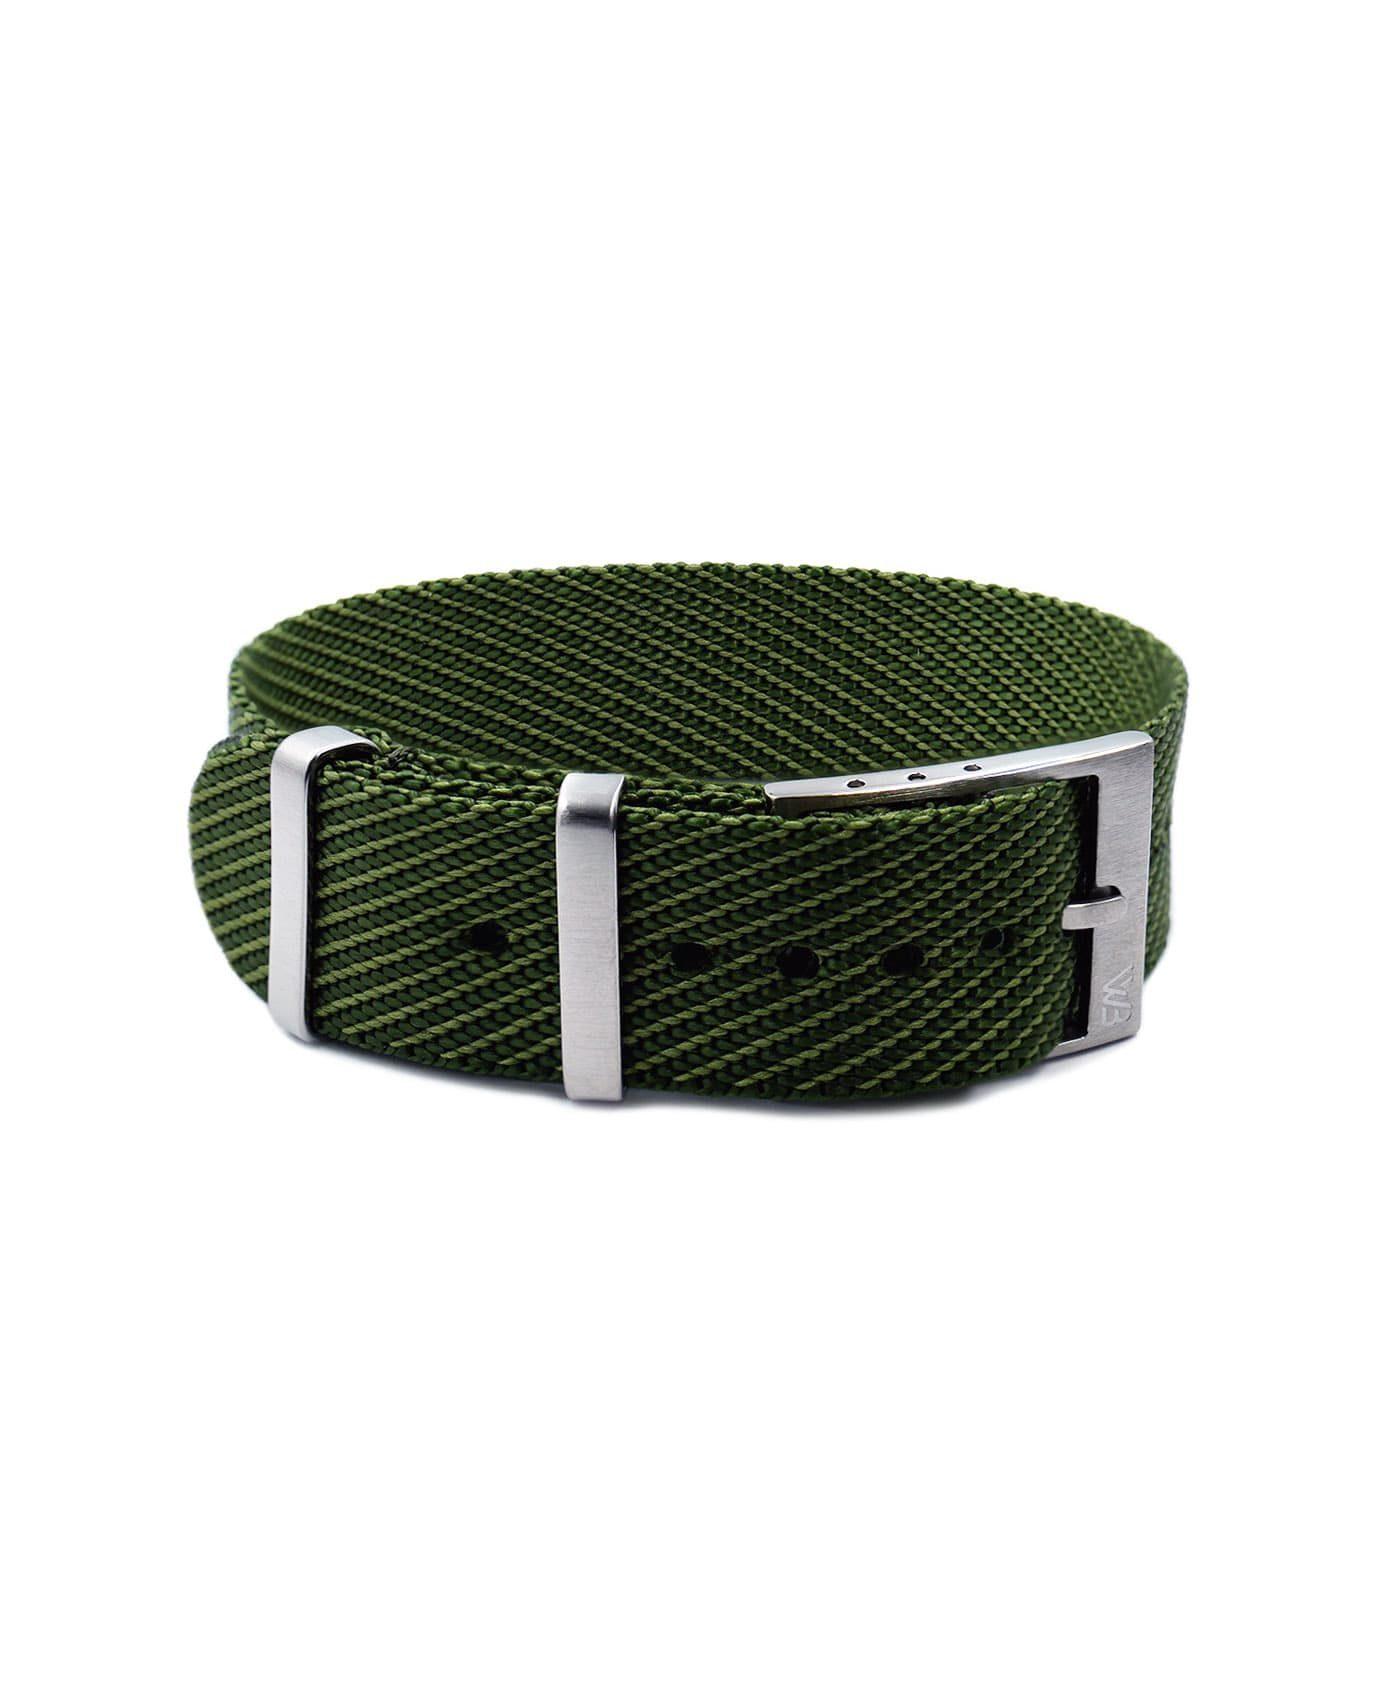 Adjustable NATO strap green front